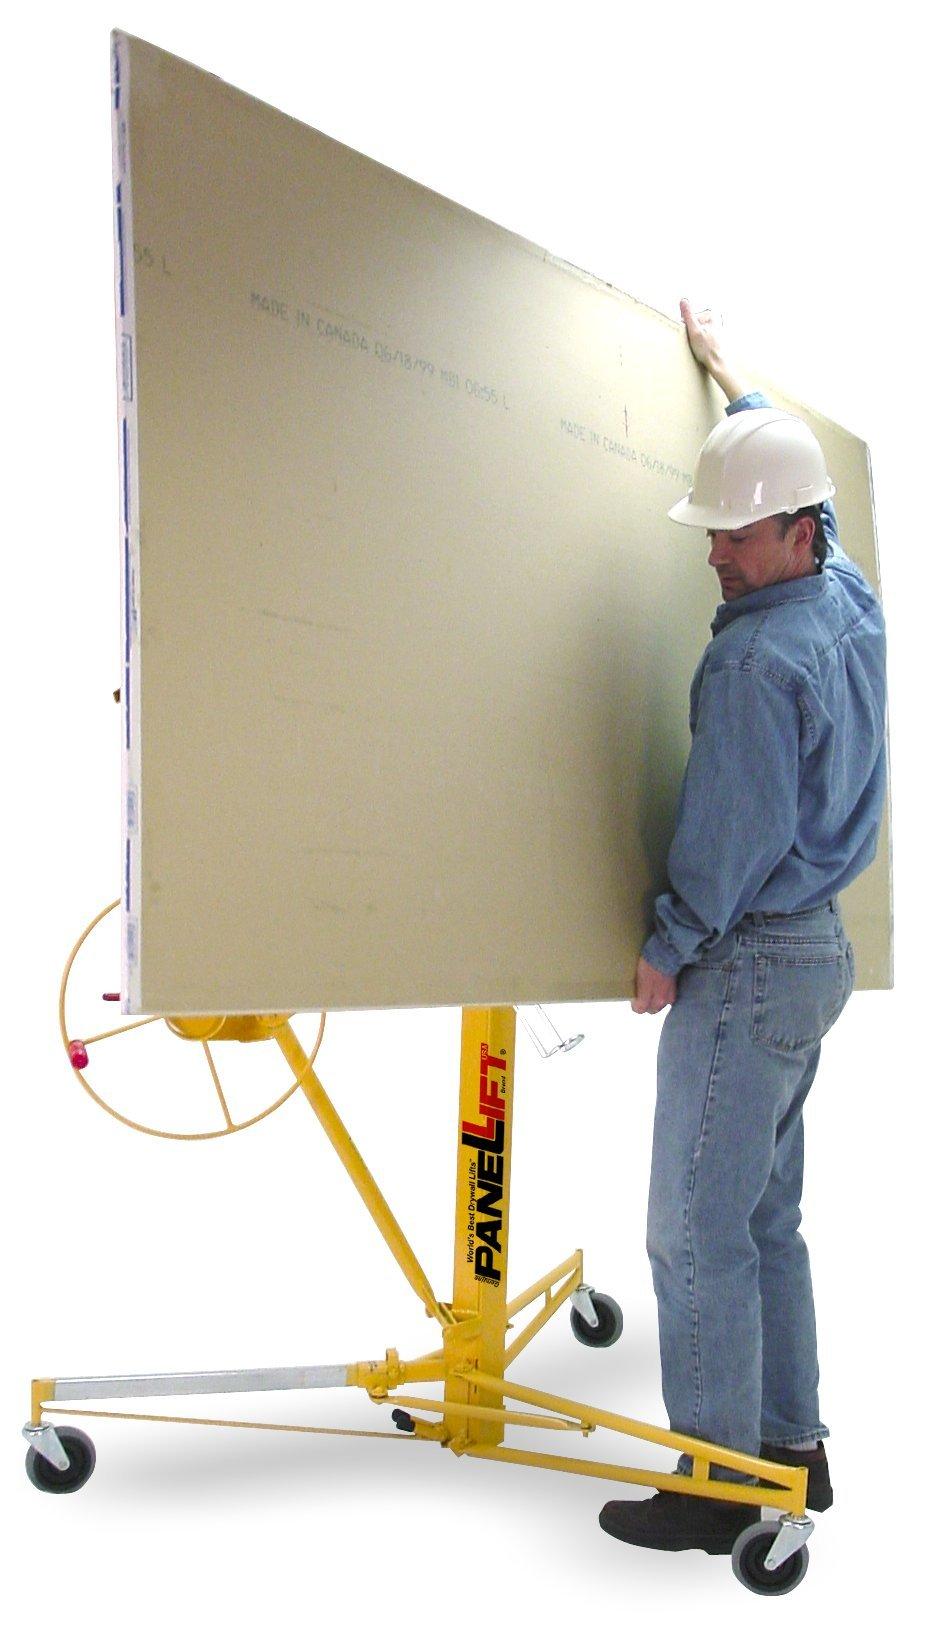 Telpro Inc. PANELLIFT PanelLift Drywall Lifter